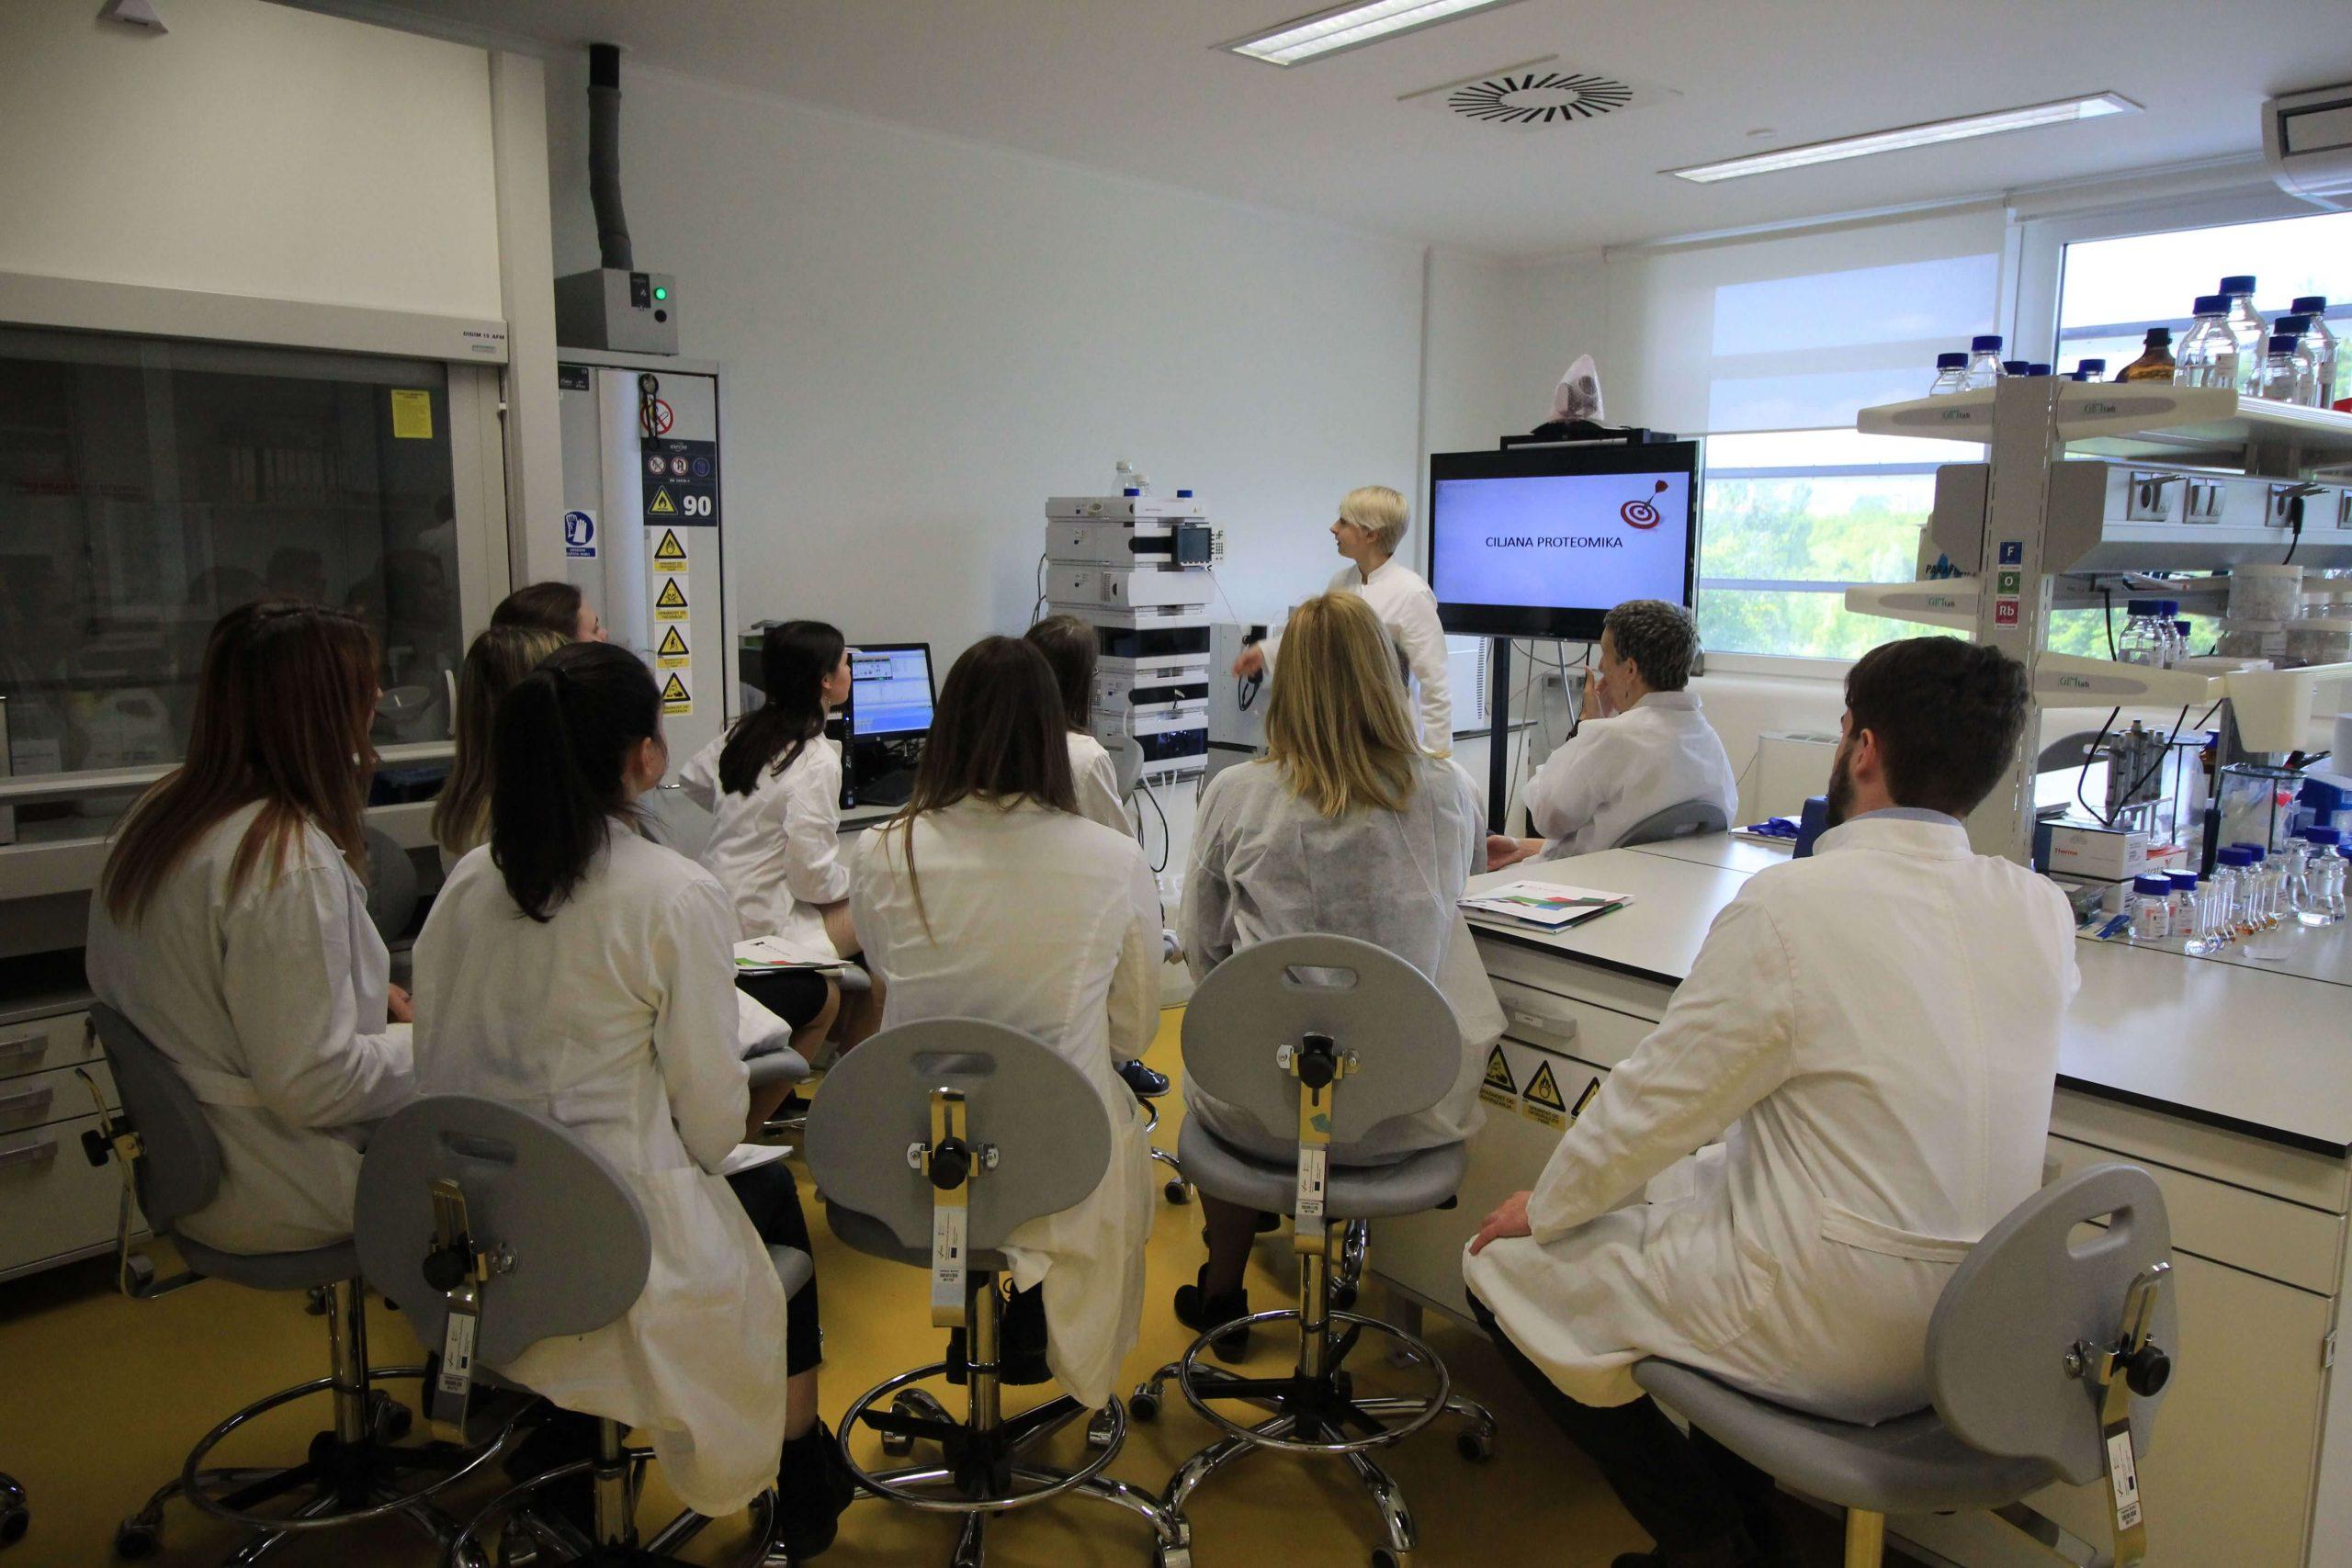 Studenti Iz Splita Analiza Identifikacija I Kvantifikacija Proteina 4 Scaled